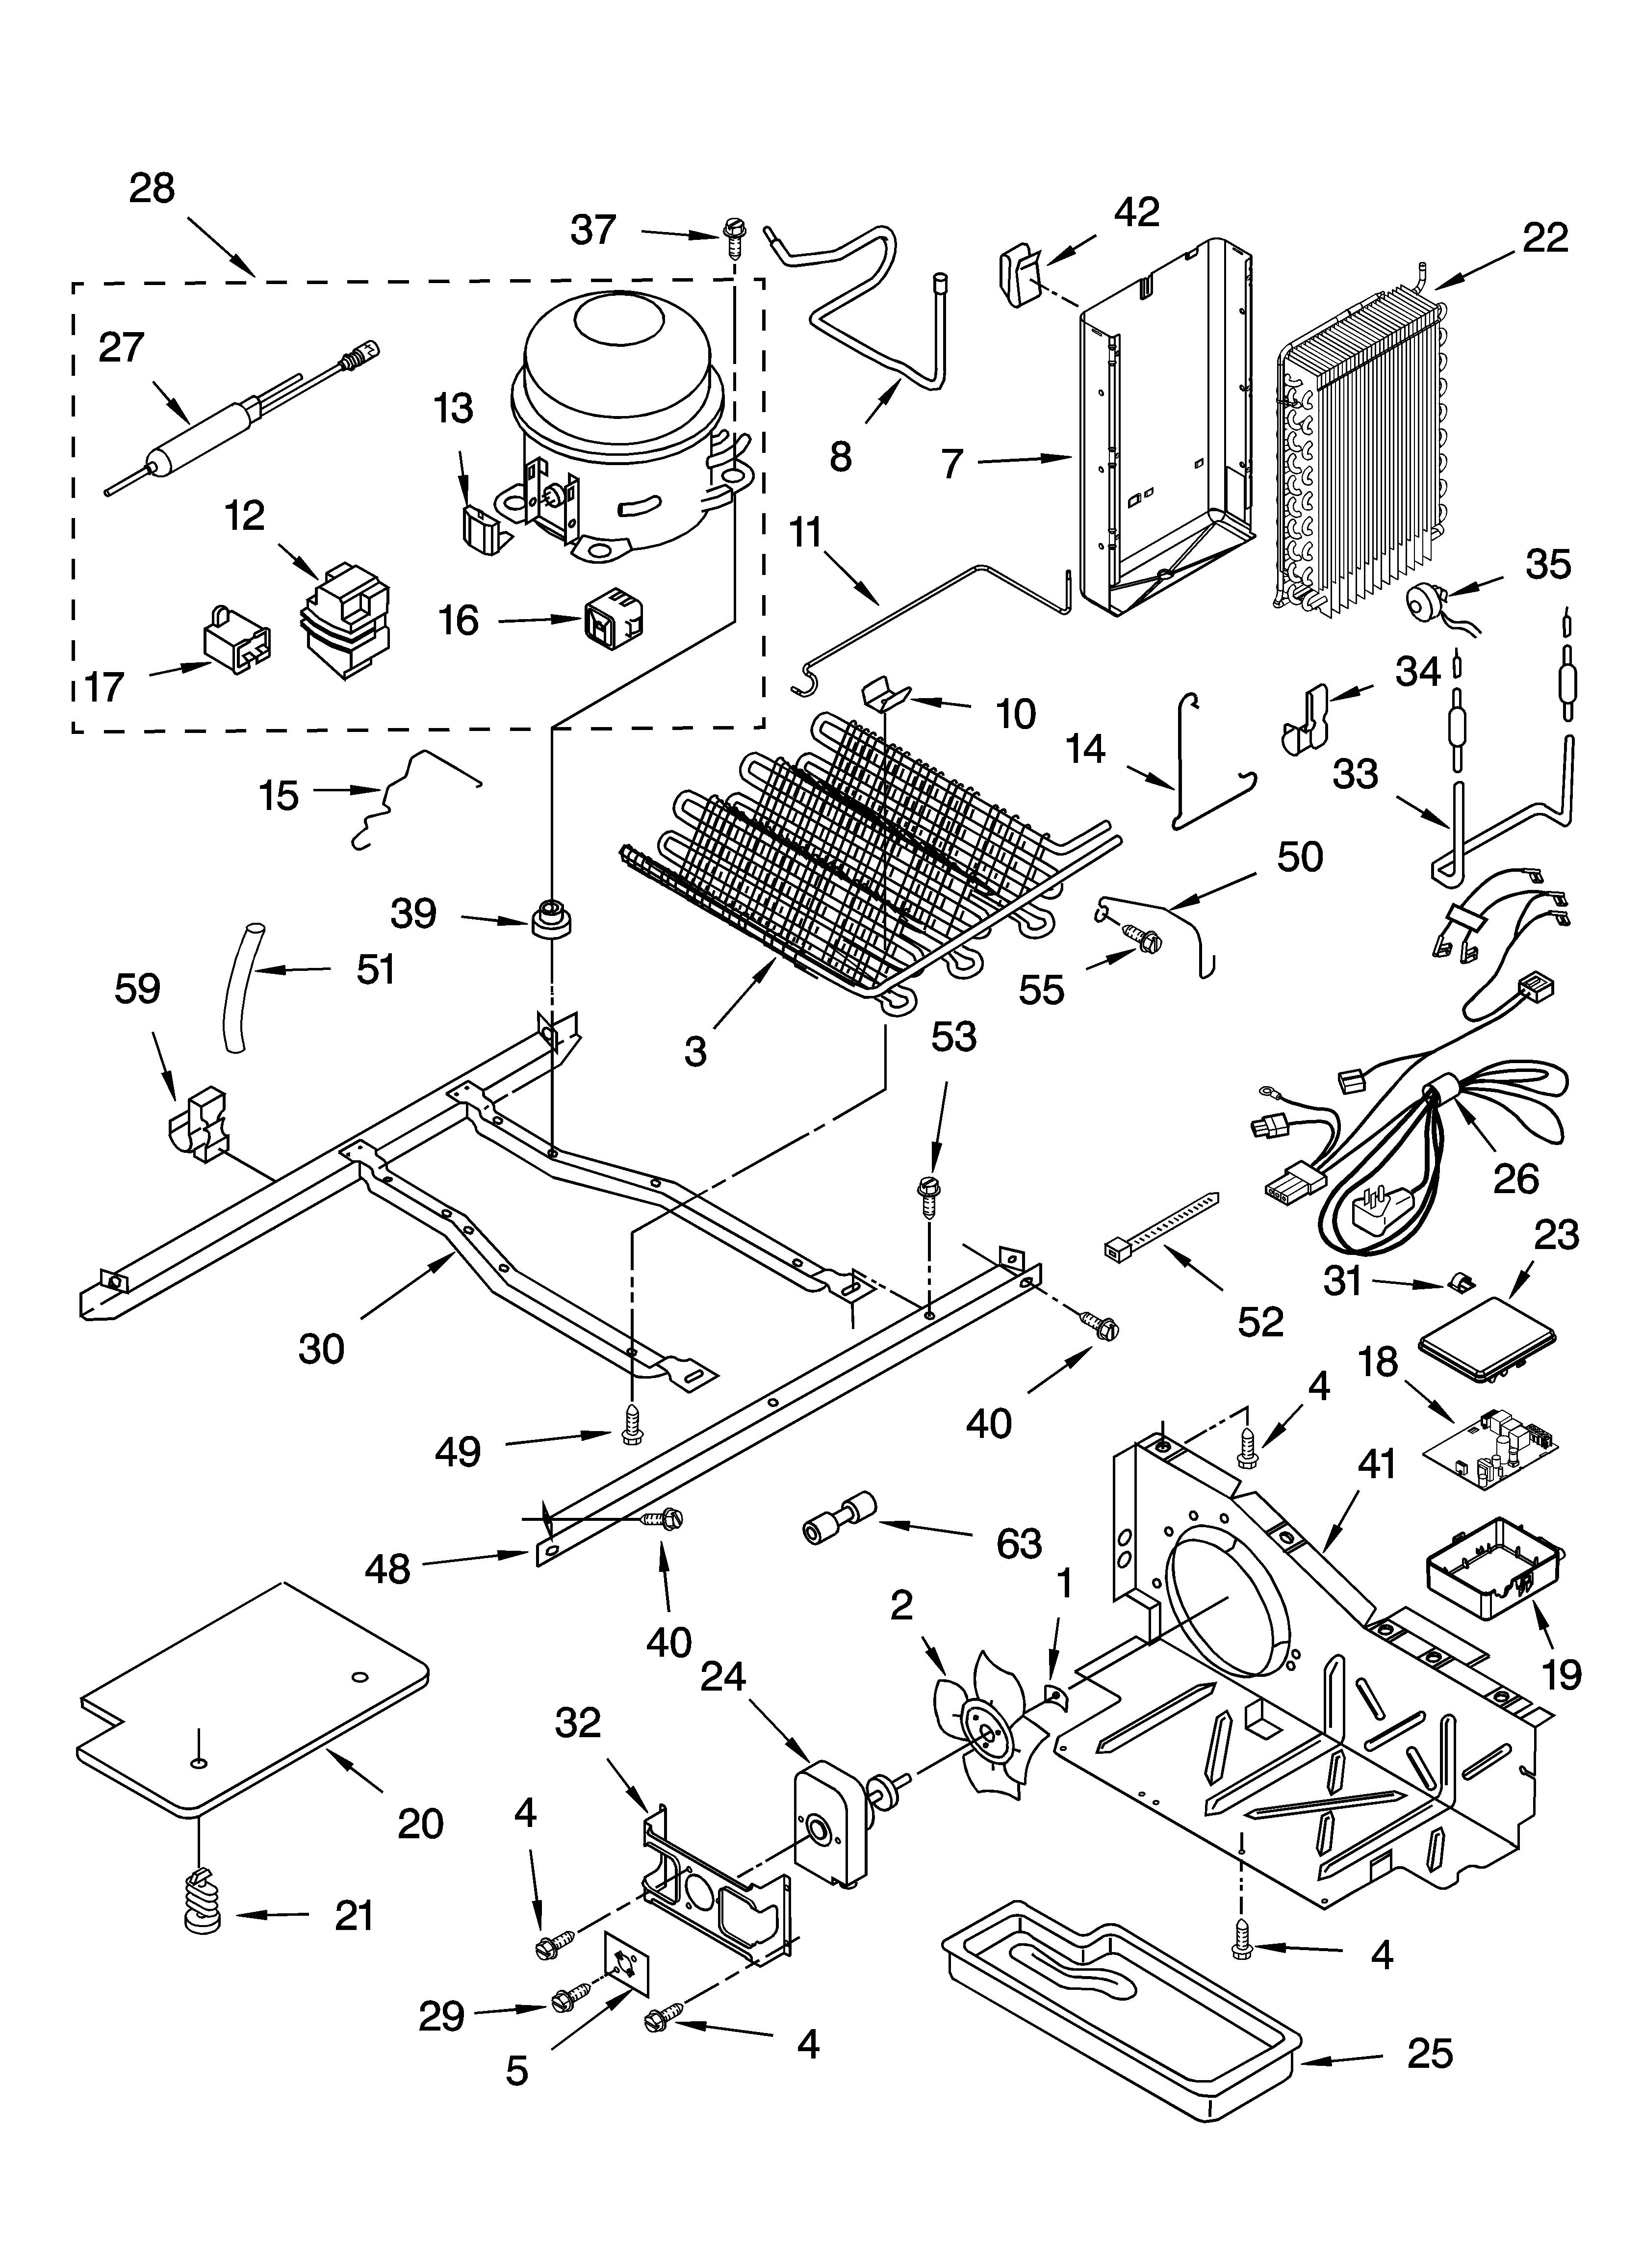 Whirlpool Gold Series Dishwasher Parts Manual